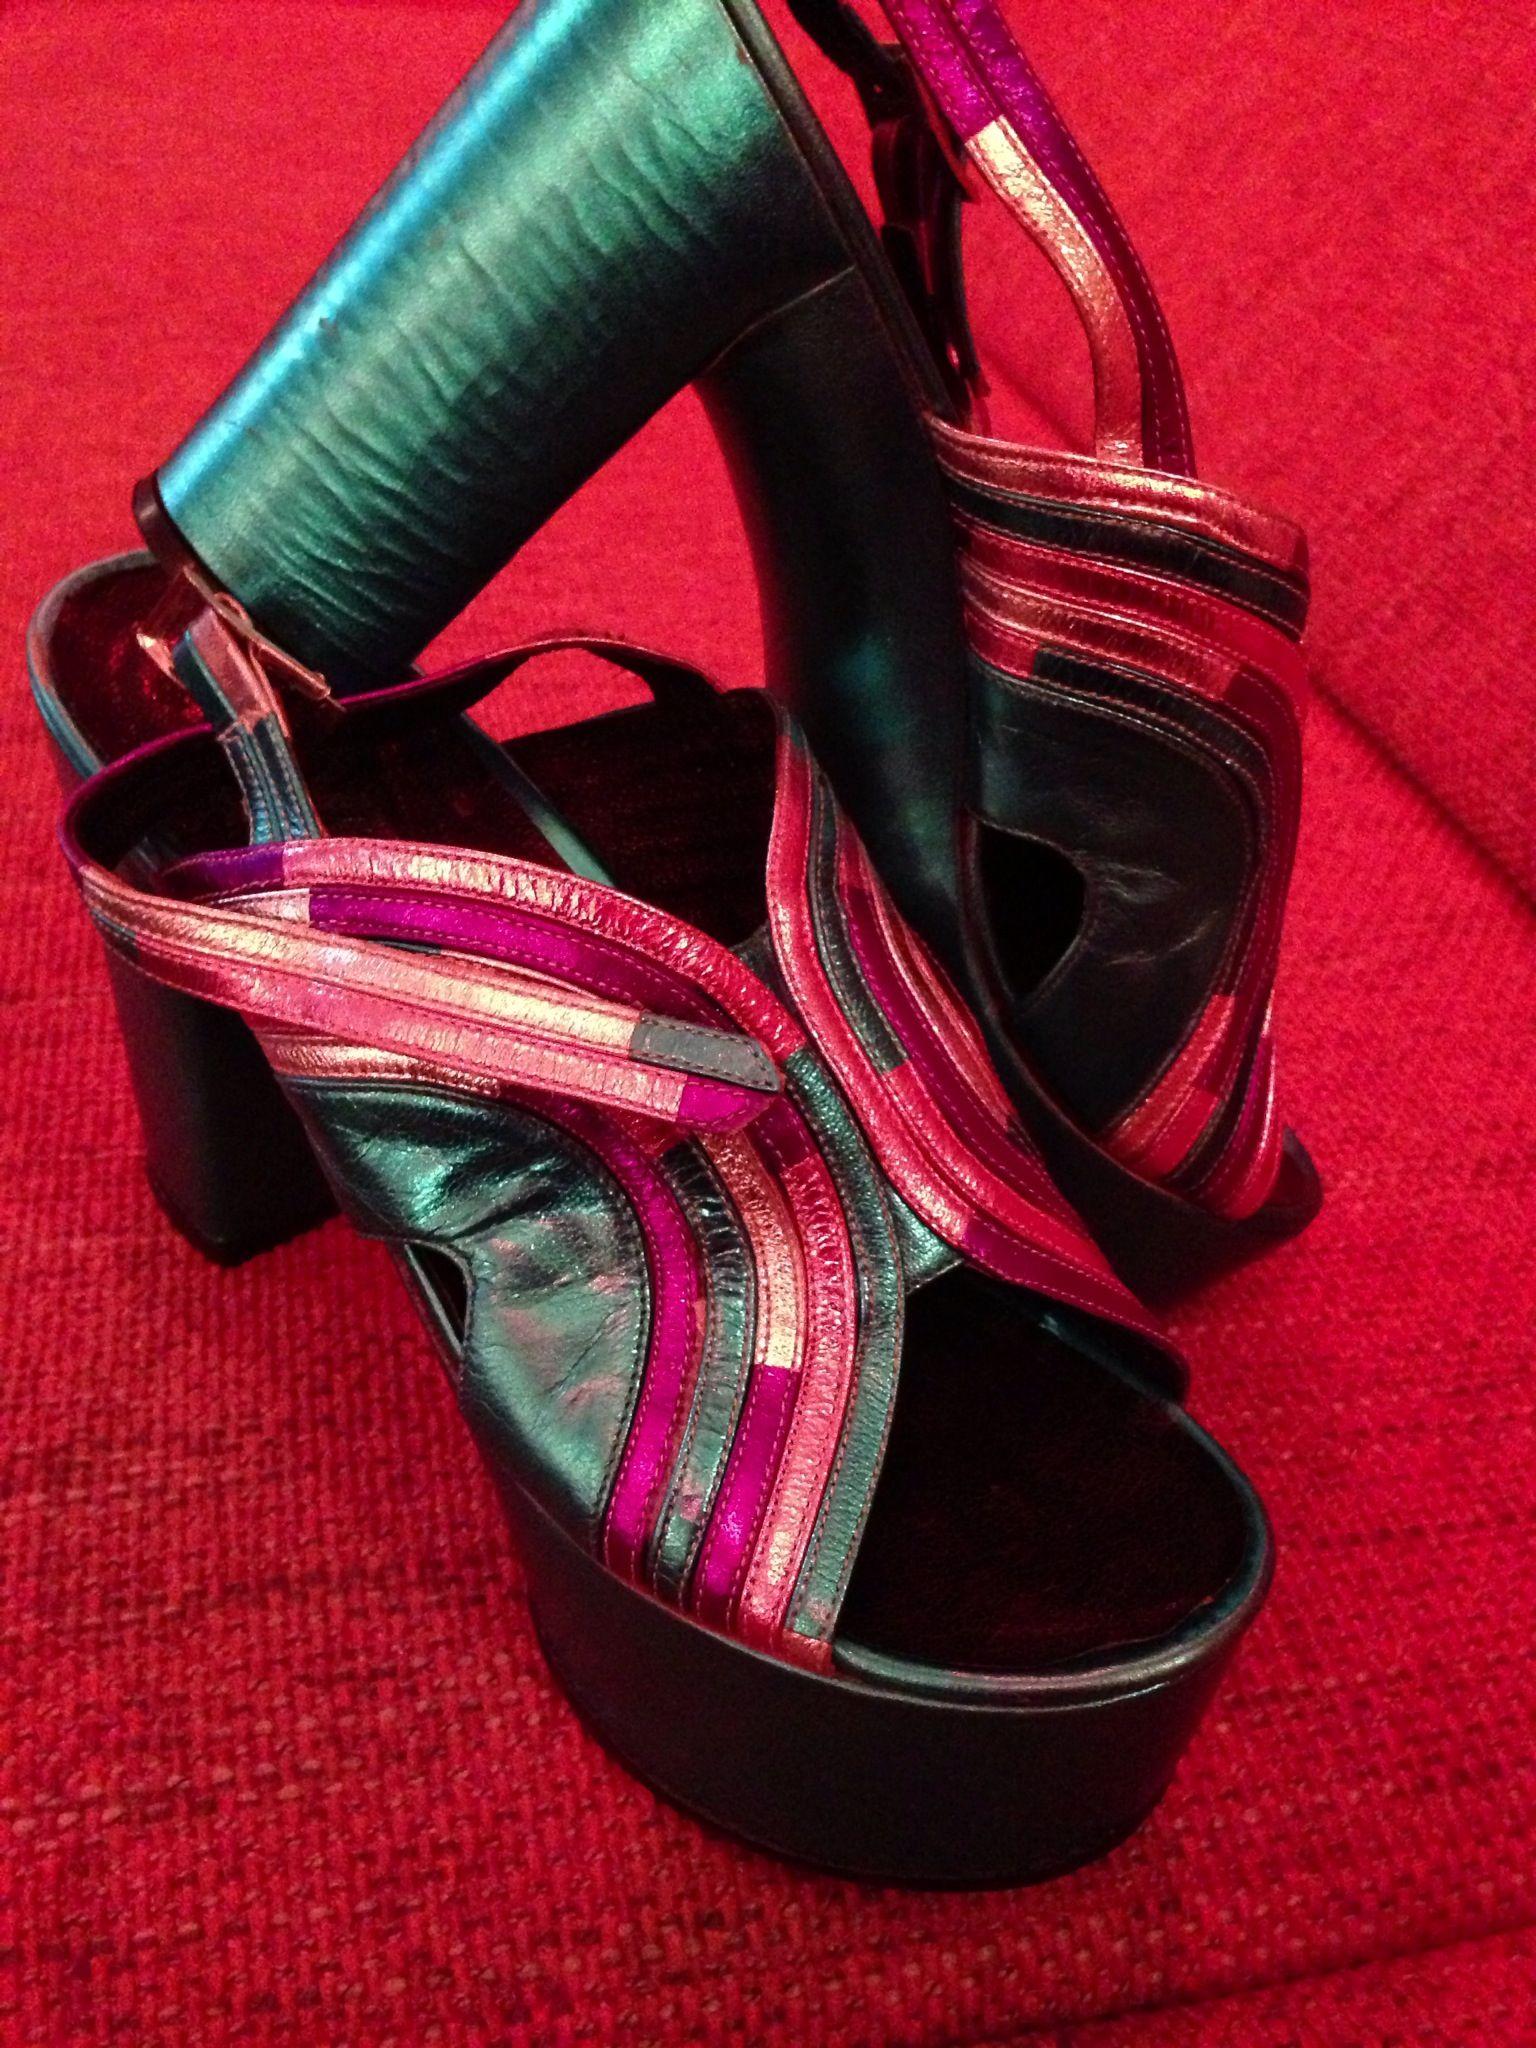 My newest shoes. 1970's metallic platforms. Italian label- Volpini